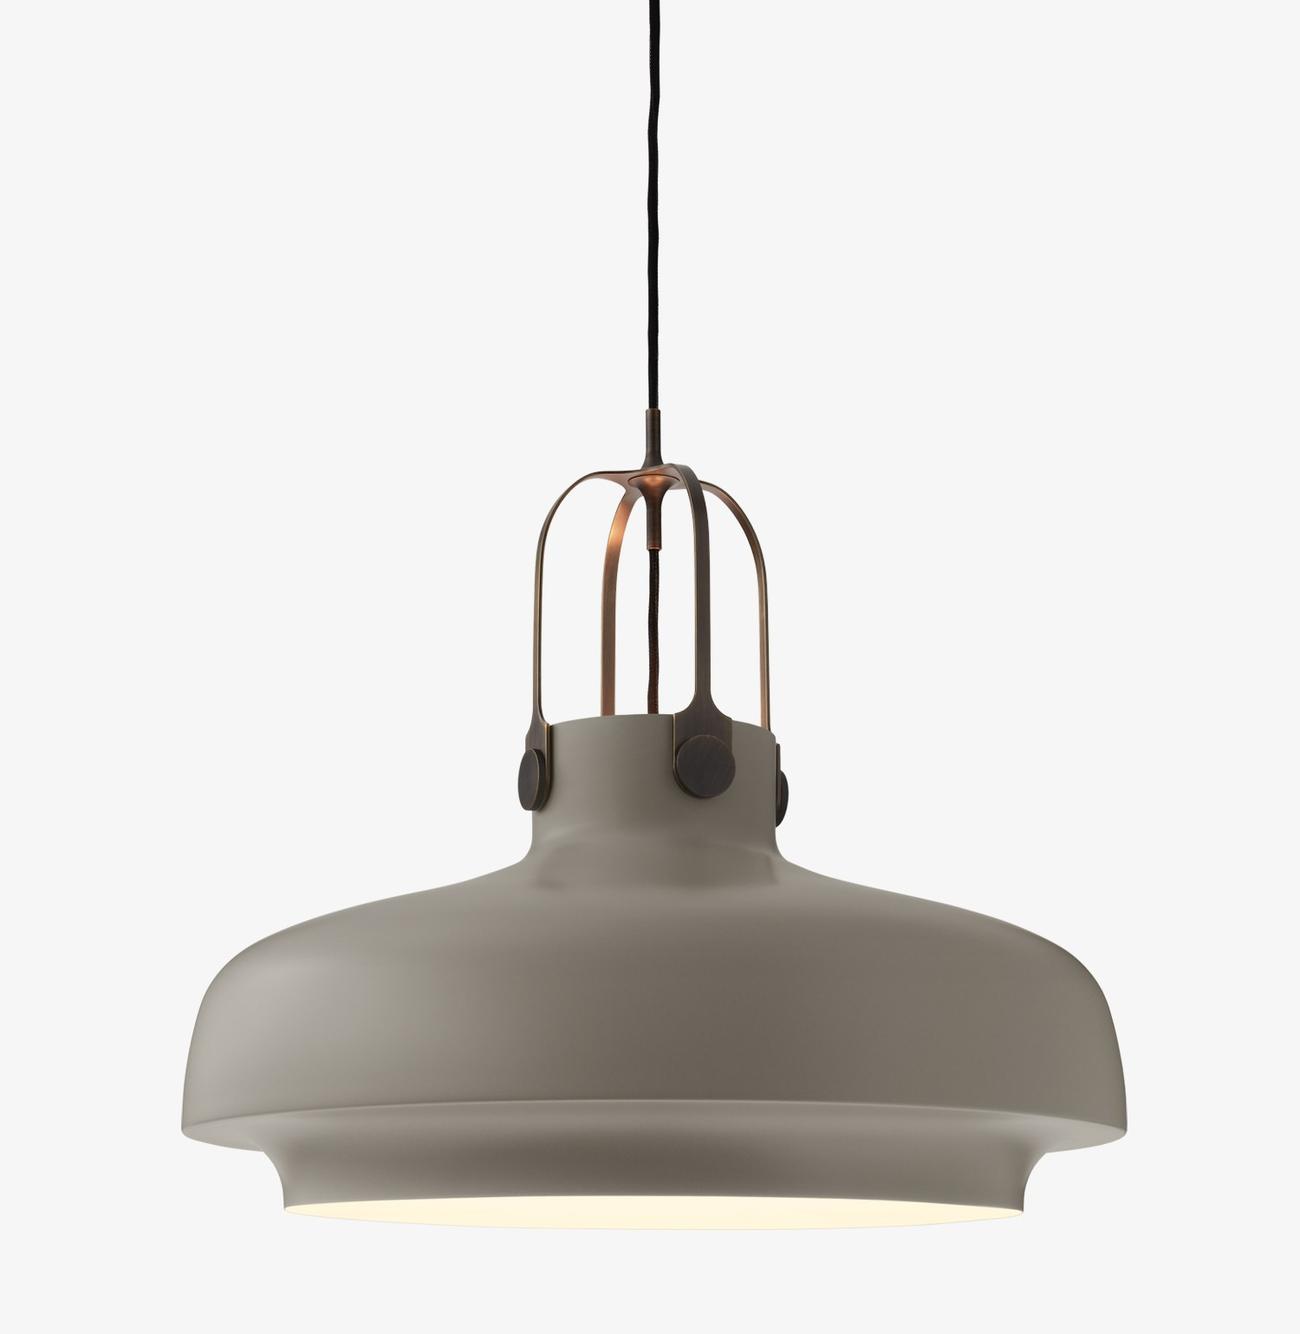 tradition Copenhagen hanglamp SC8 Stone